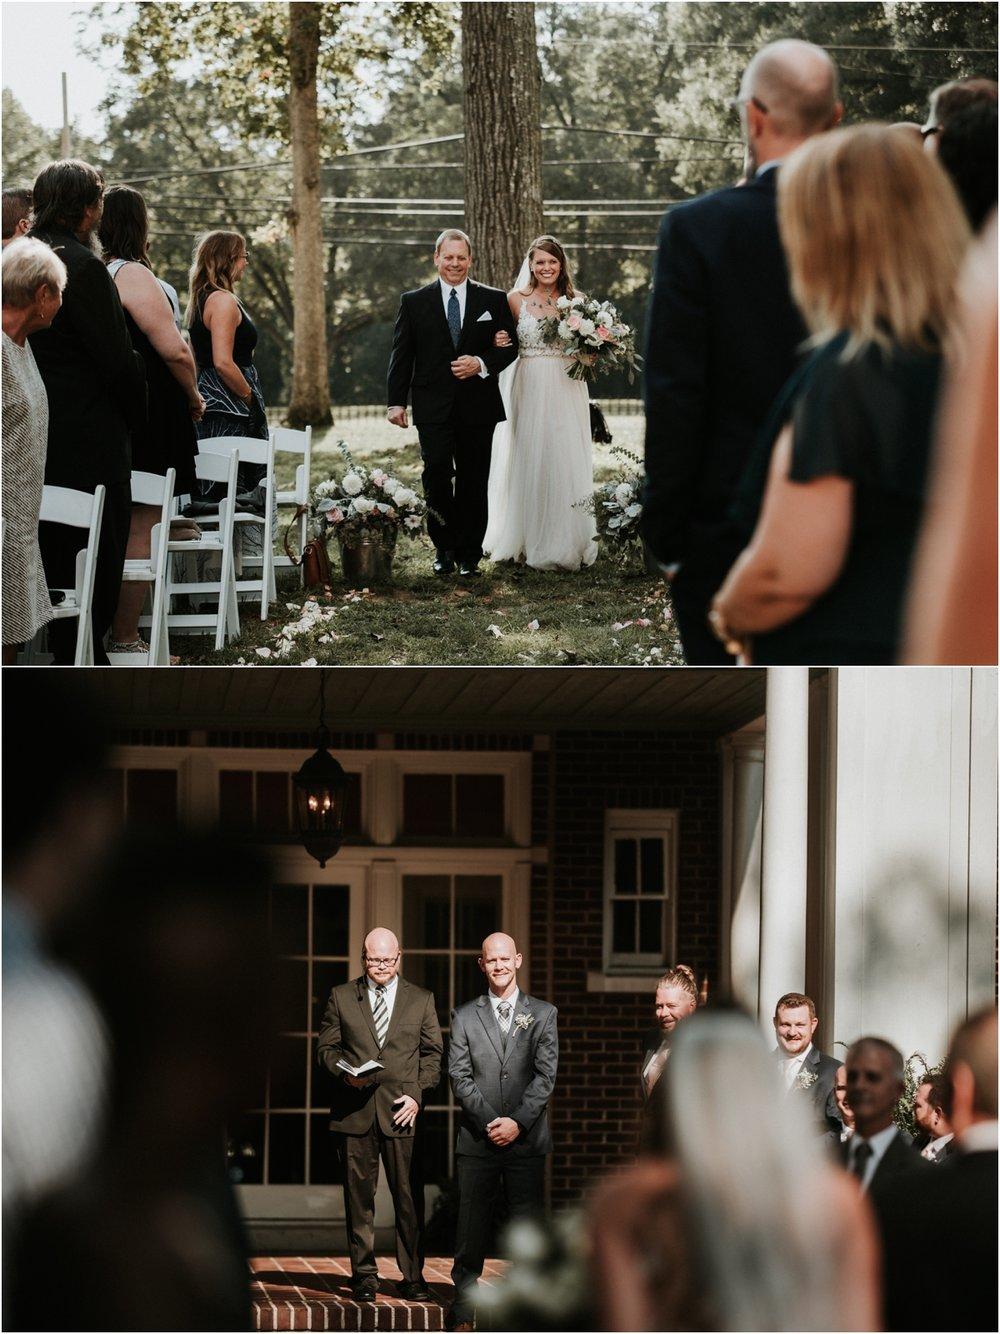 Stowe-manor-wedding-belmont-nc_0029.jpg